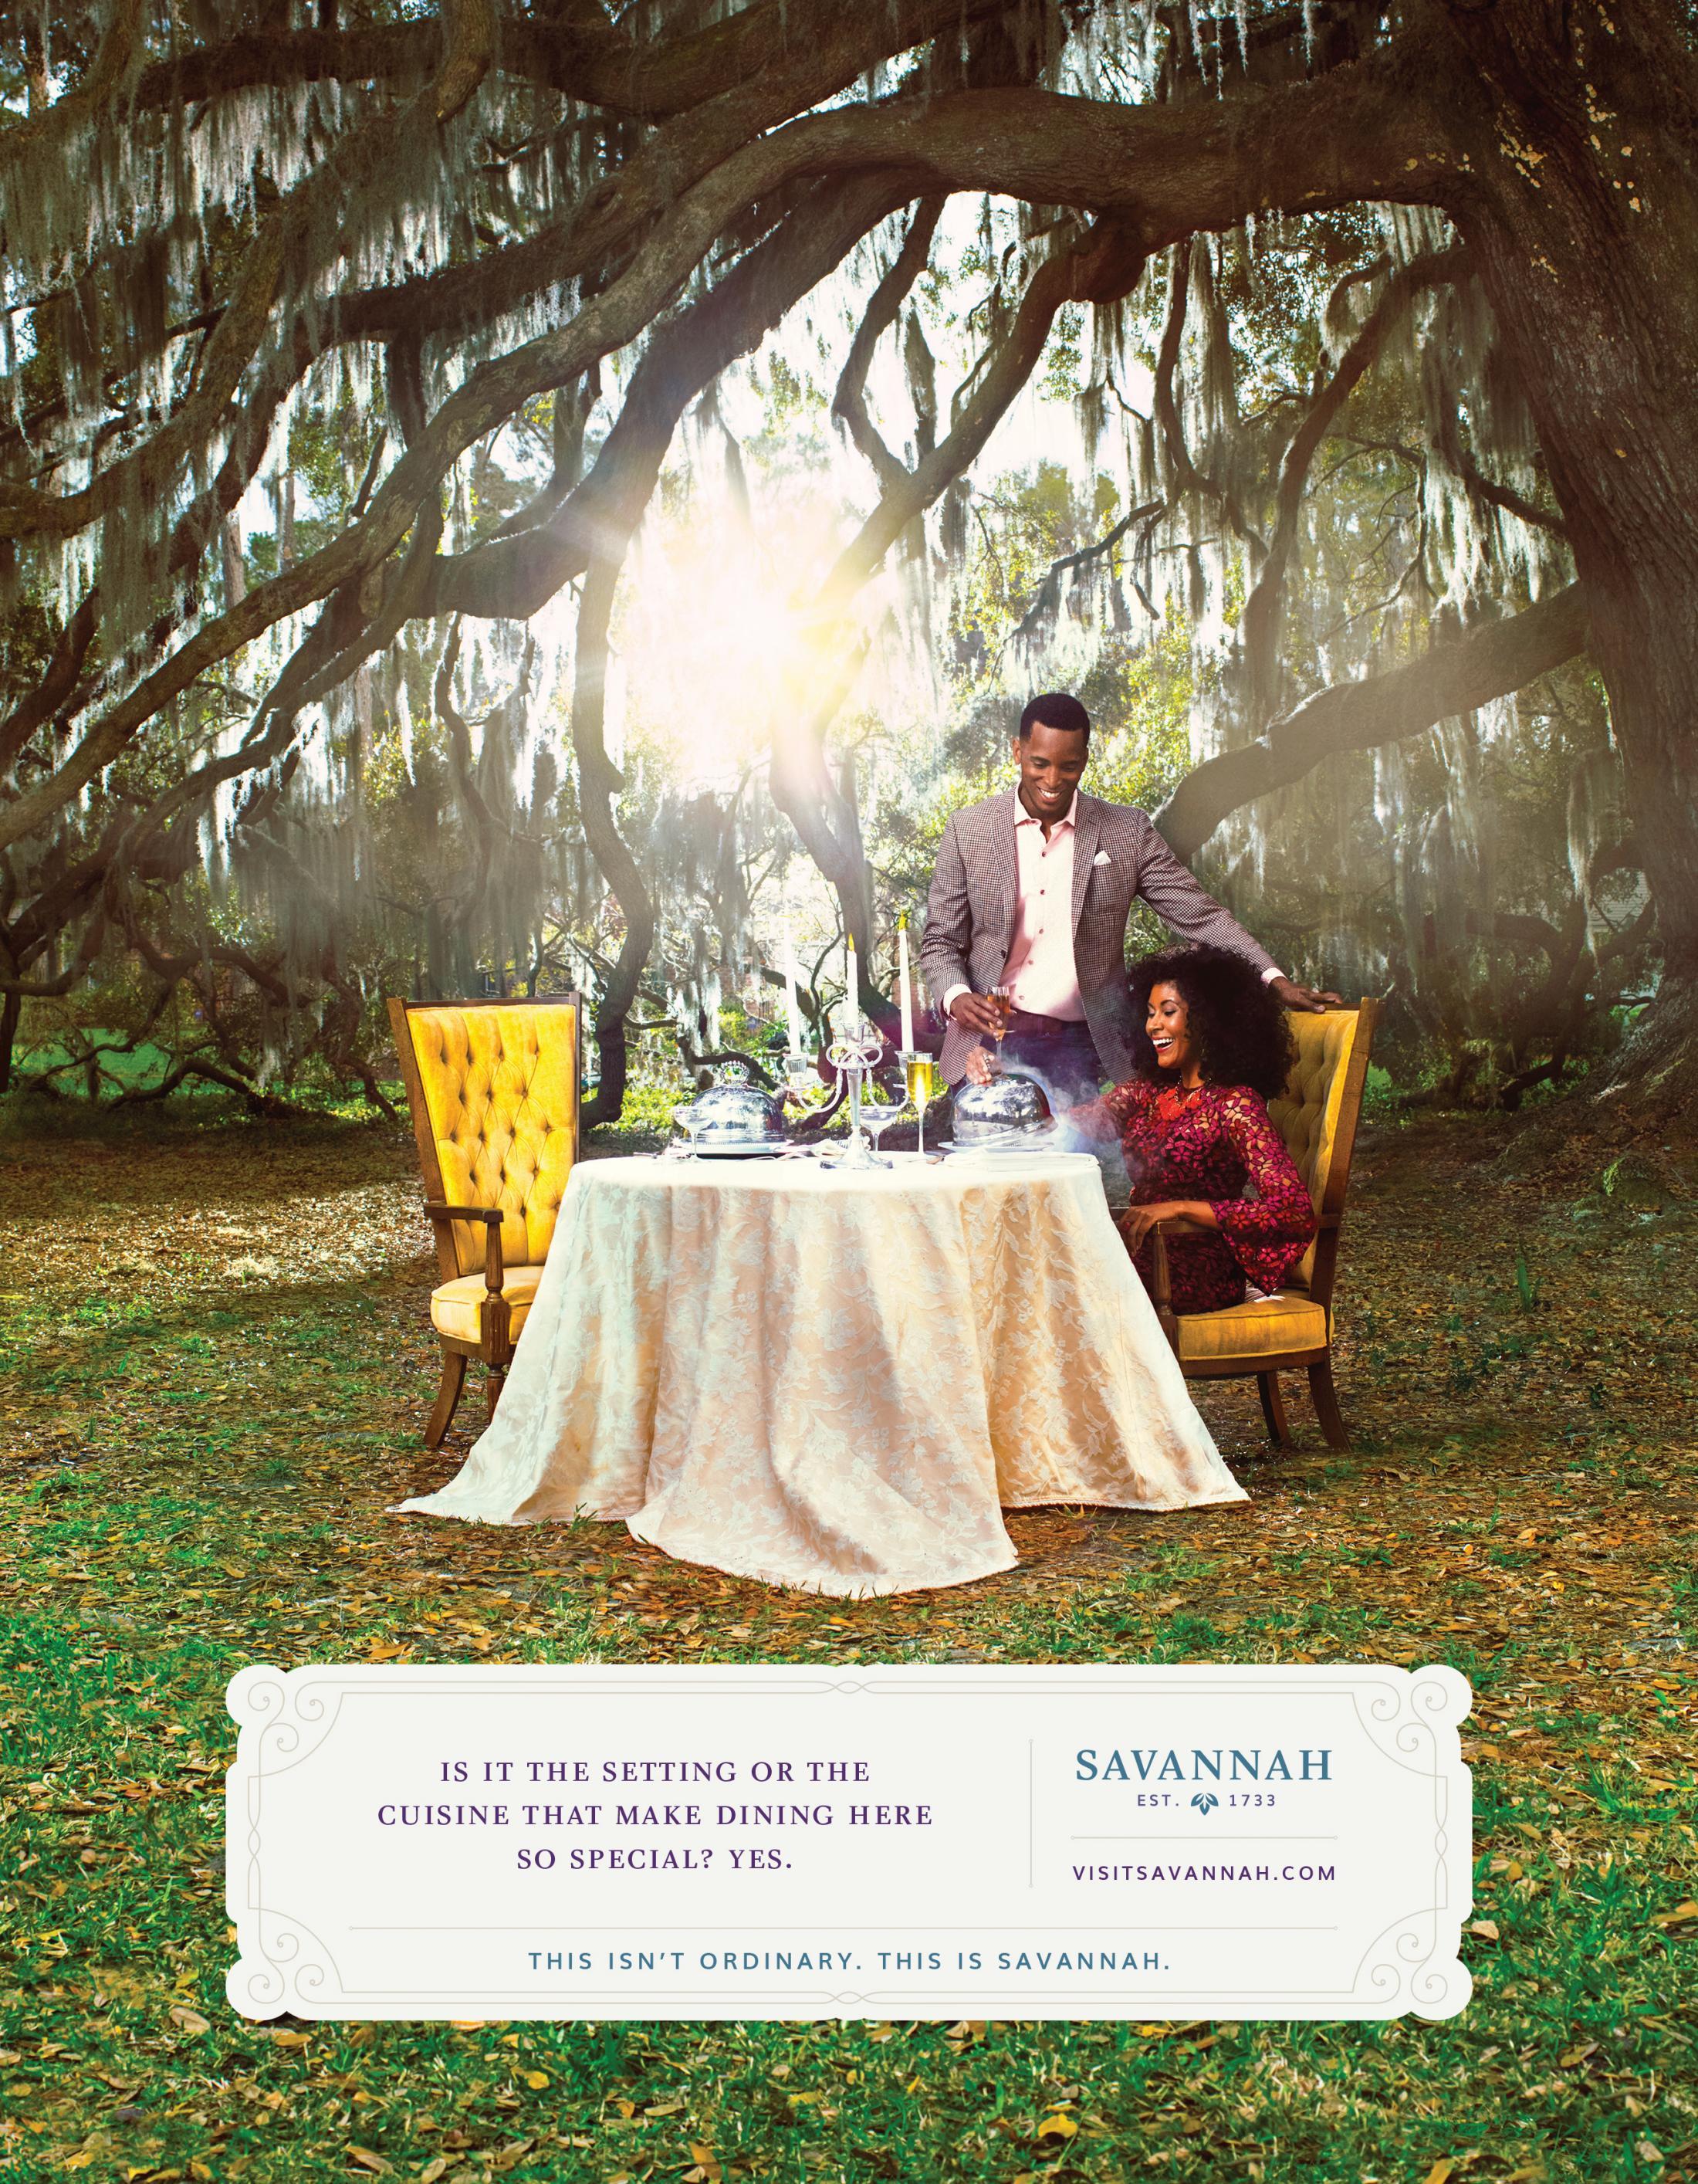 Visit Savannah Print Ad - Dining Under Majestic Oaks